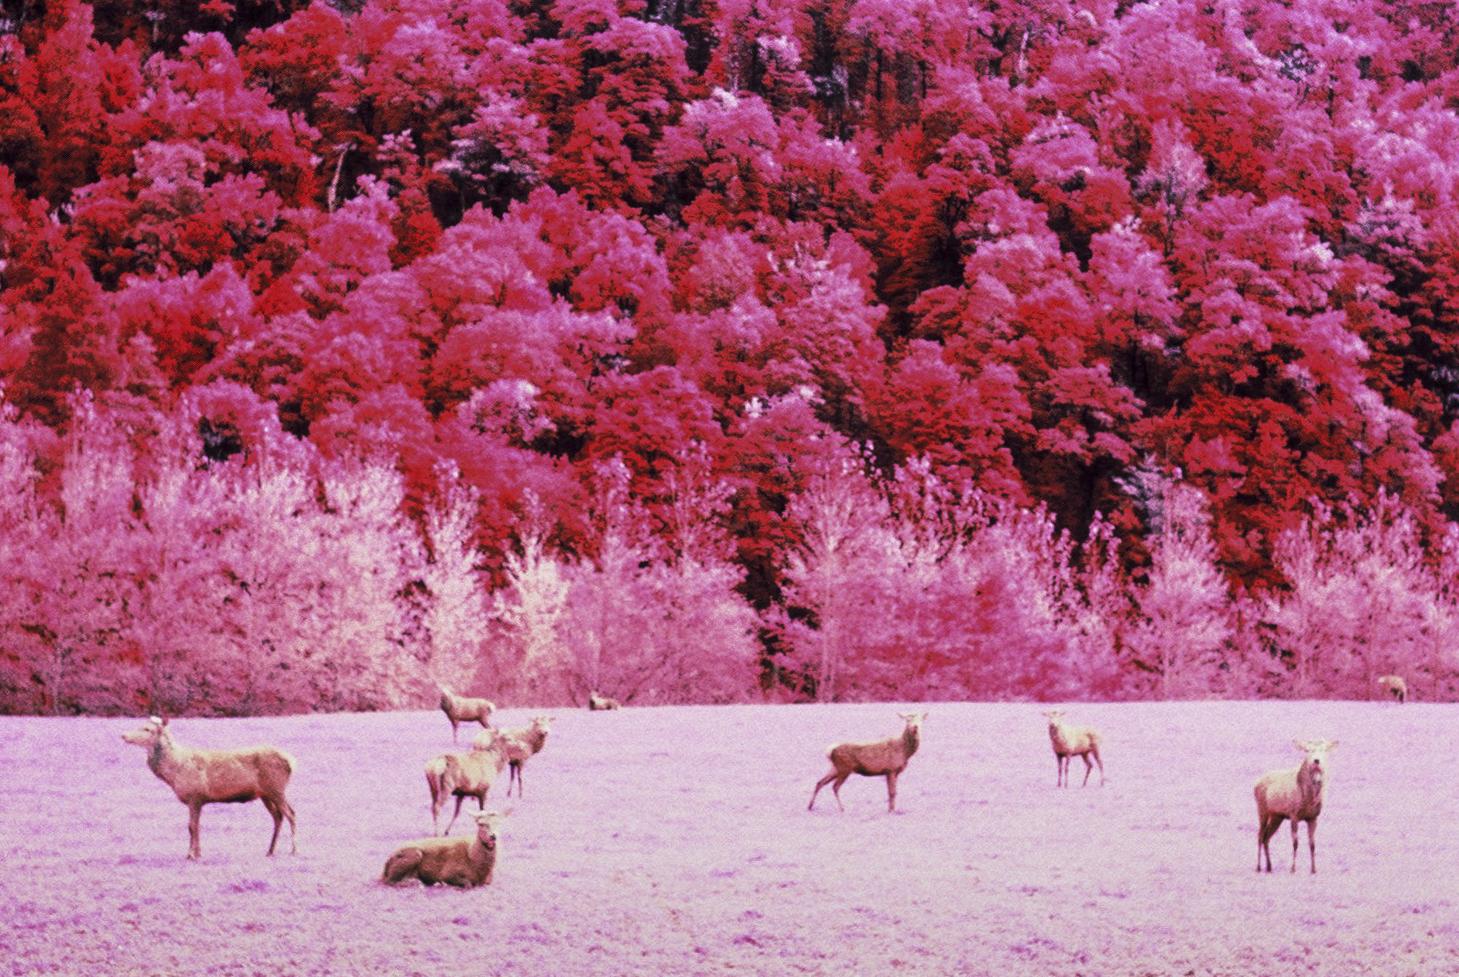 Infrared-New-Zealand-Kasia-Sykus-4.jpg